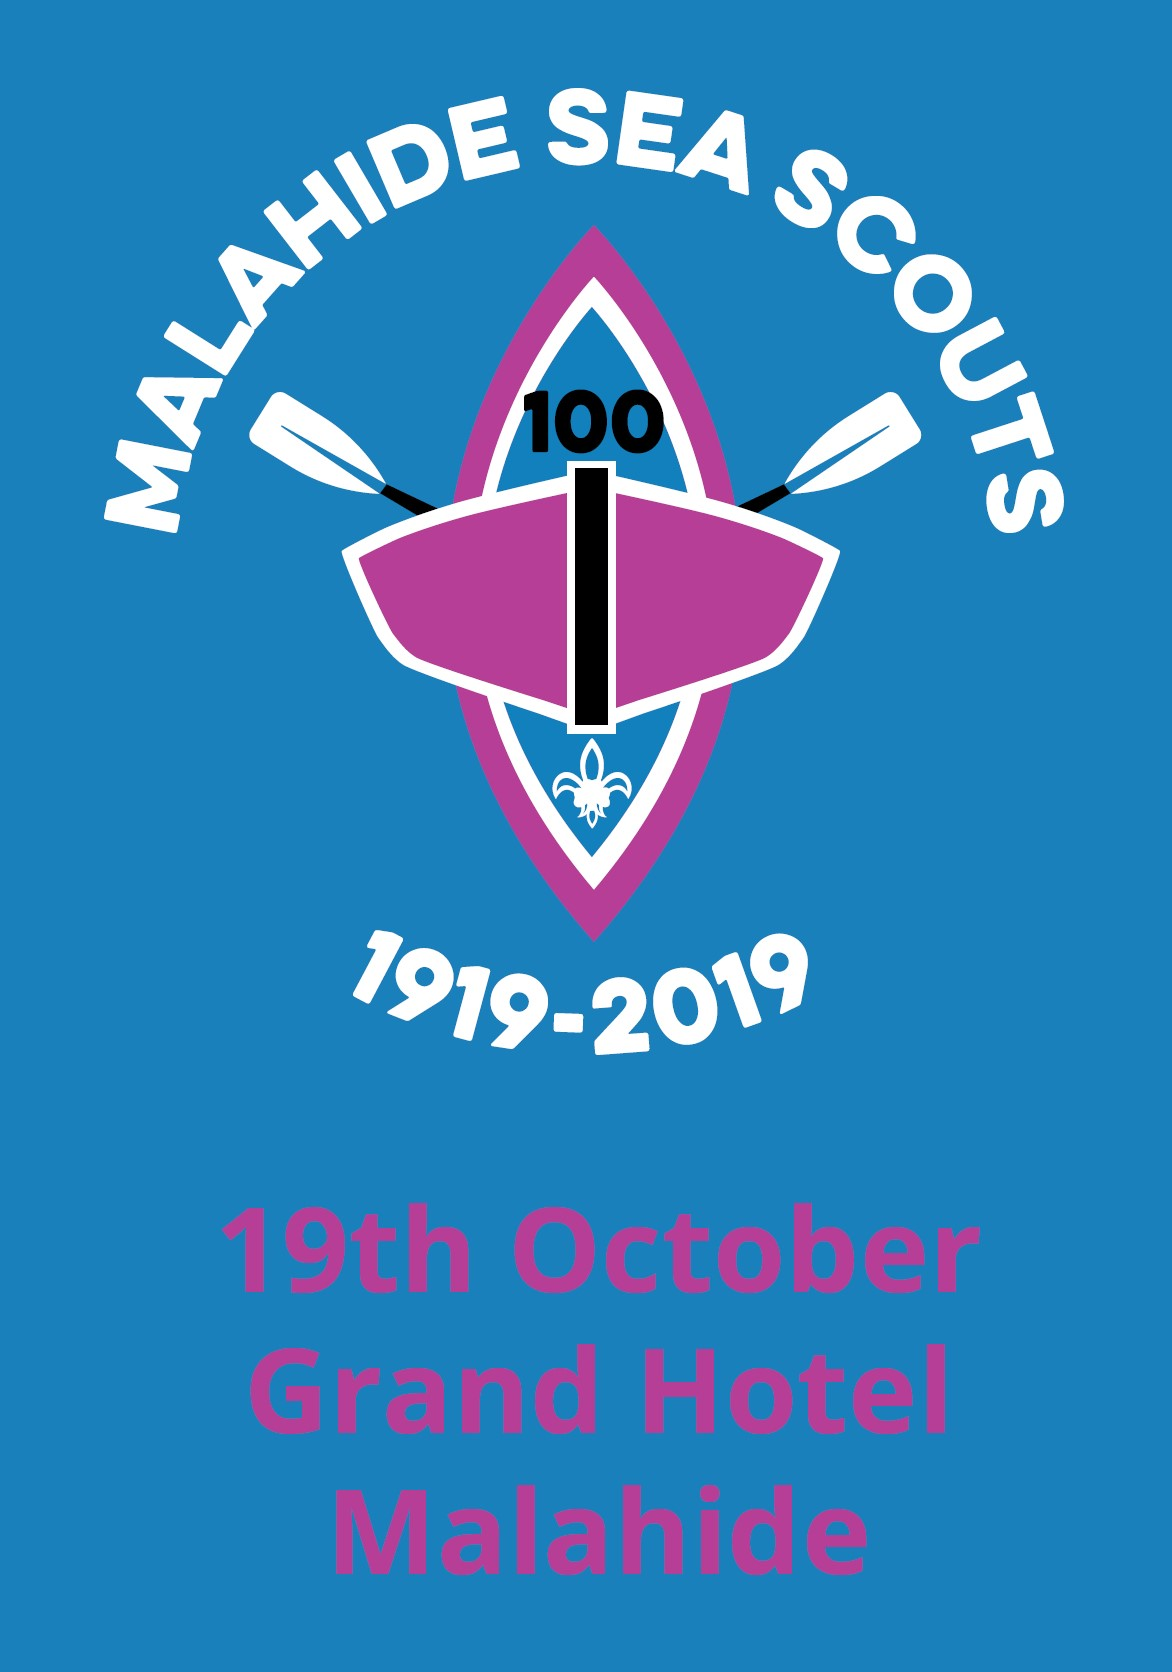 Malahide Sea Scouts Centenary Black Tie Ball -